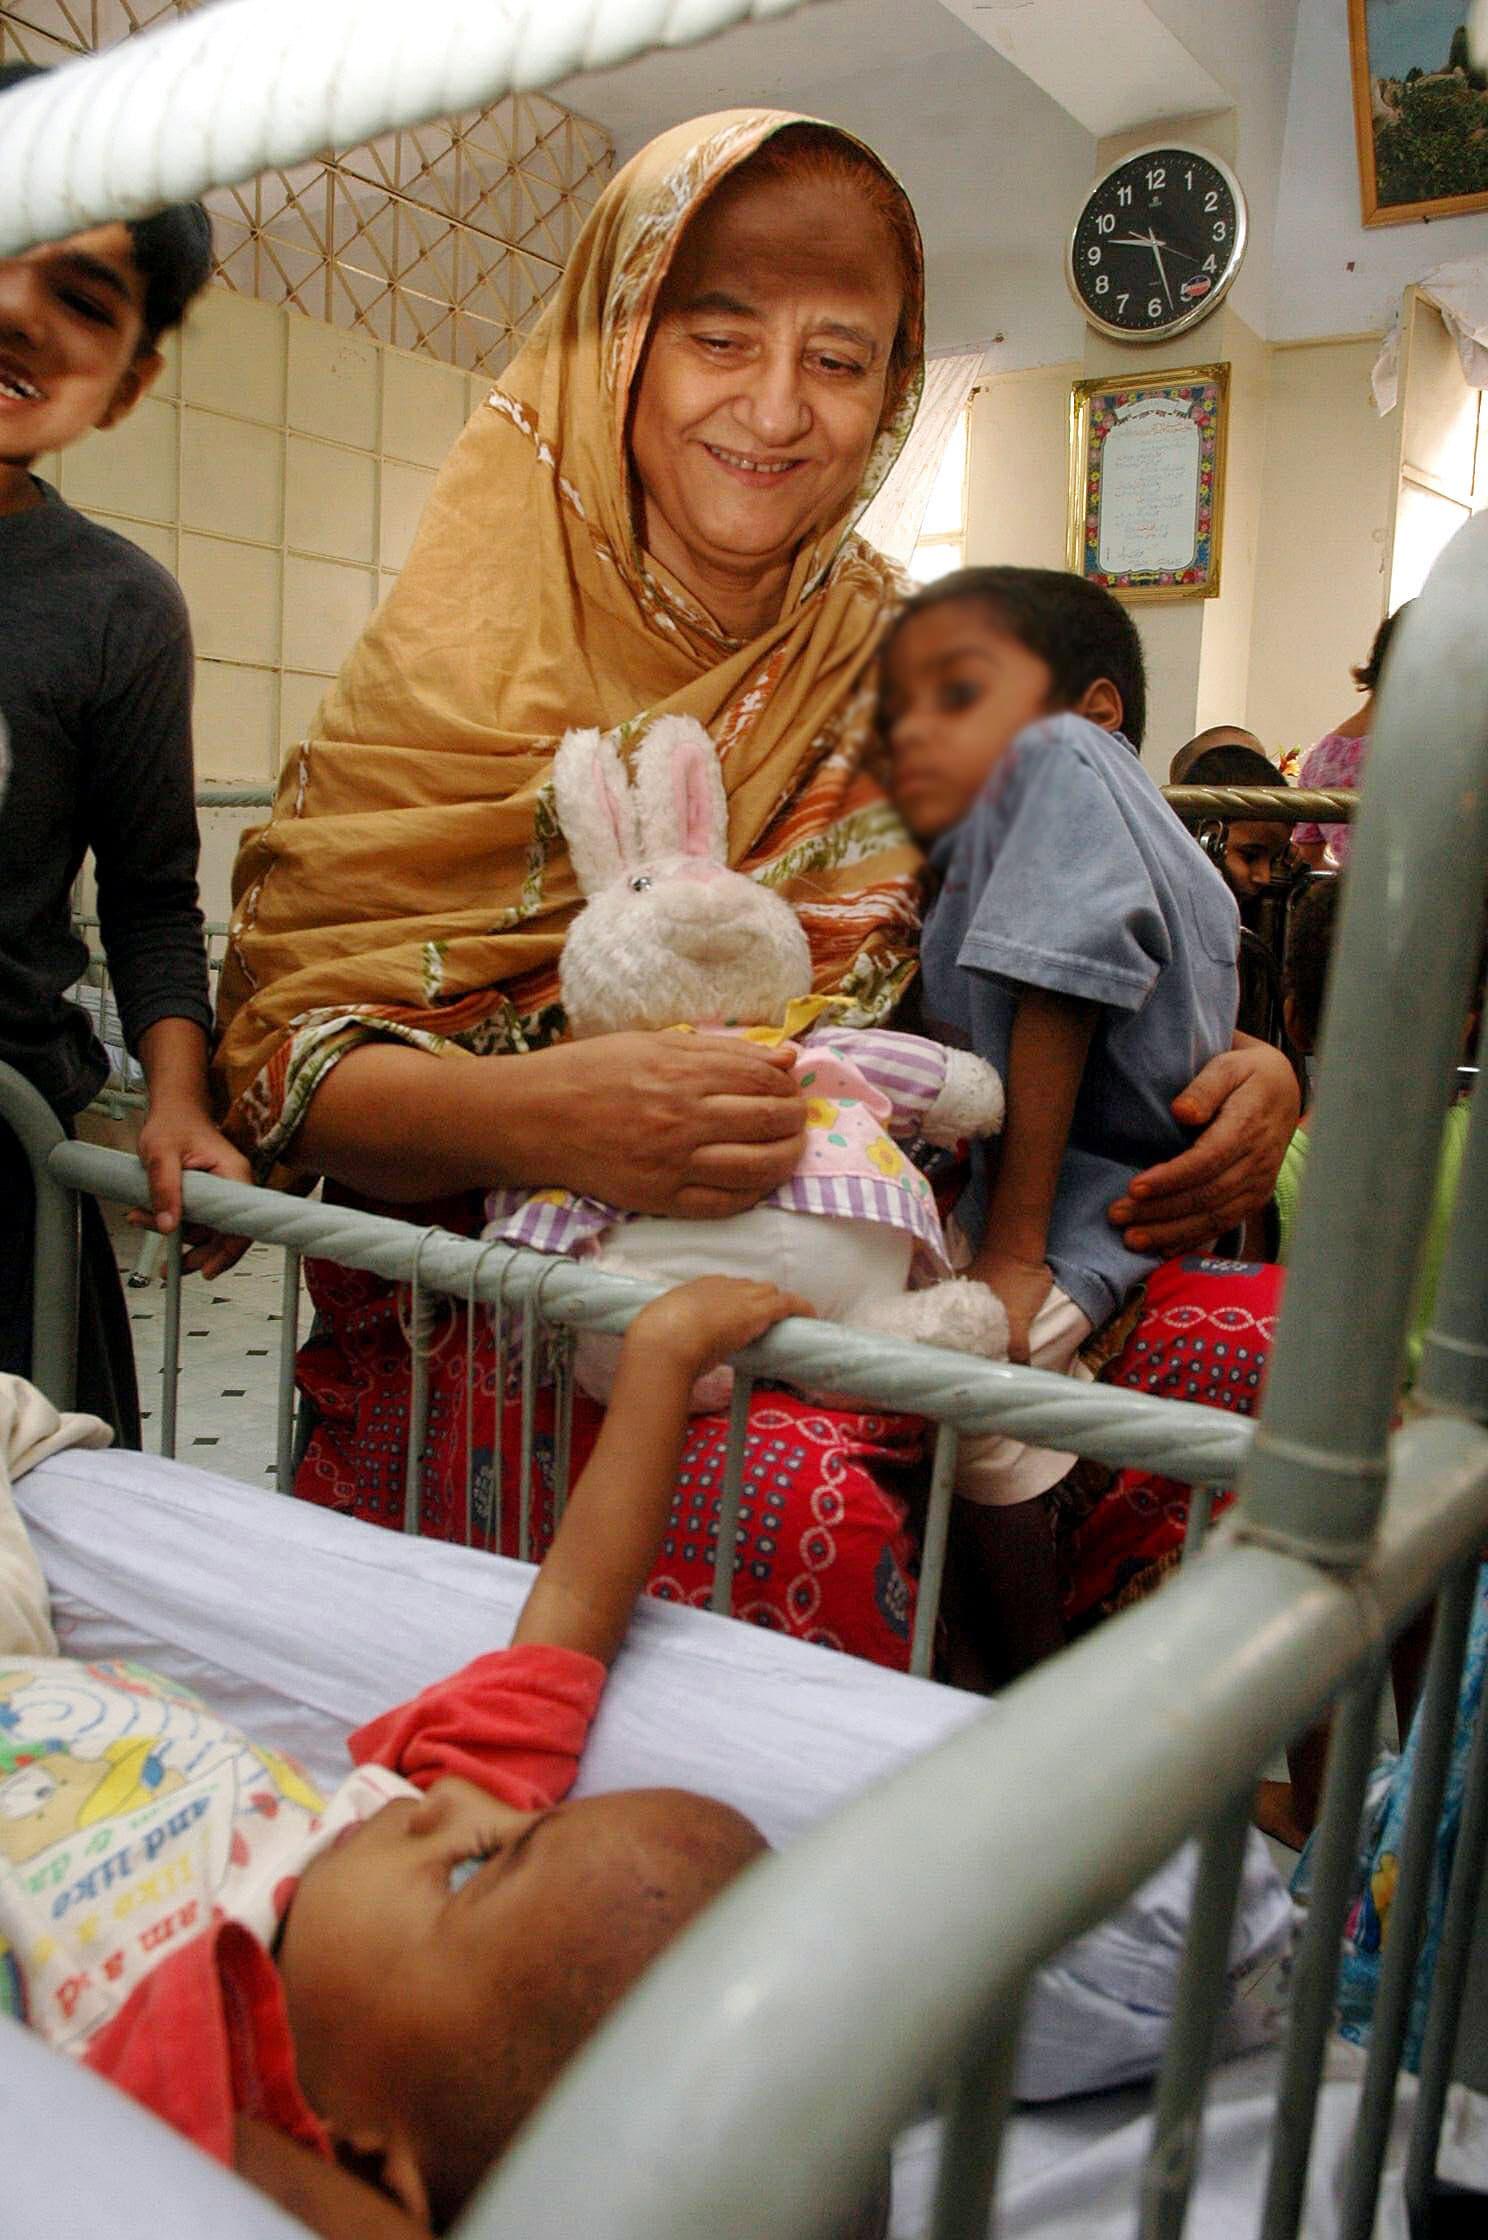 Bilquis Edhi at an Edhi Centre in Karachi | Fahim Siddiqi/White Star